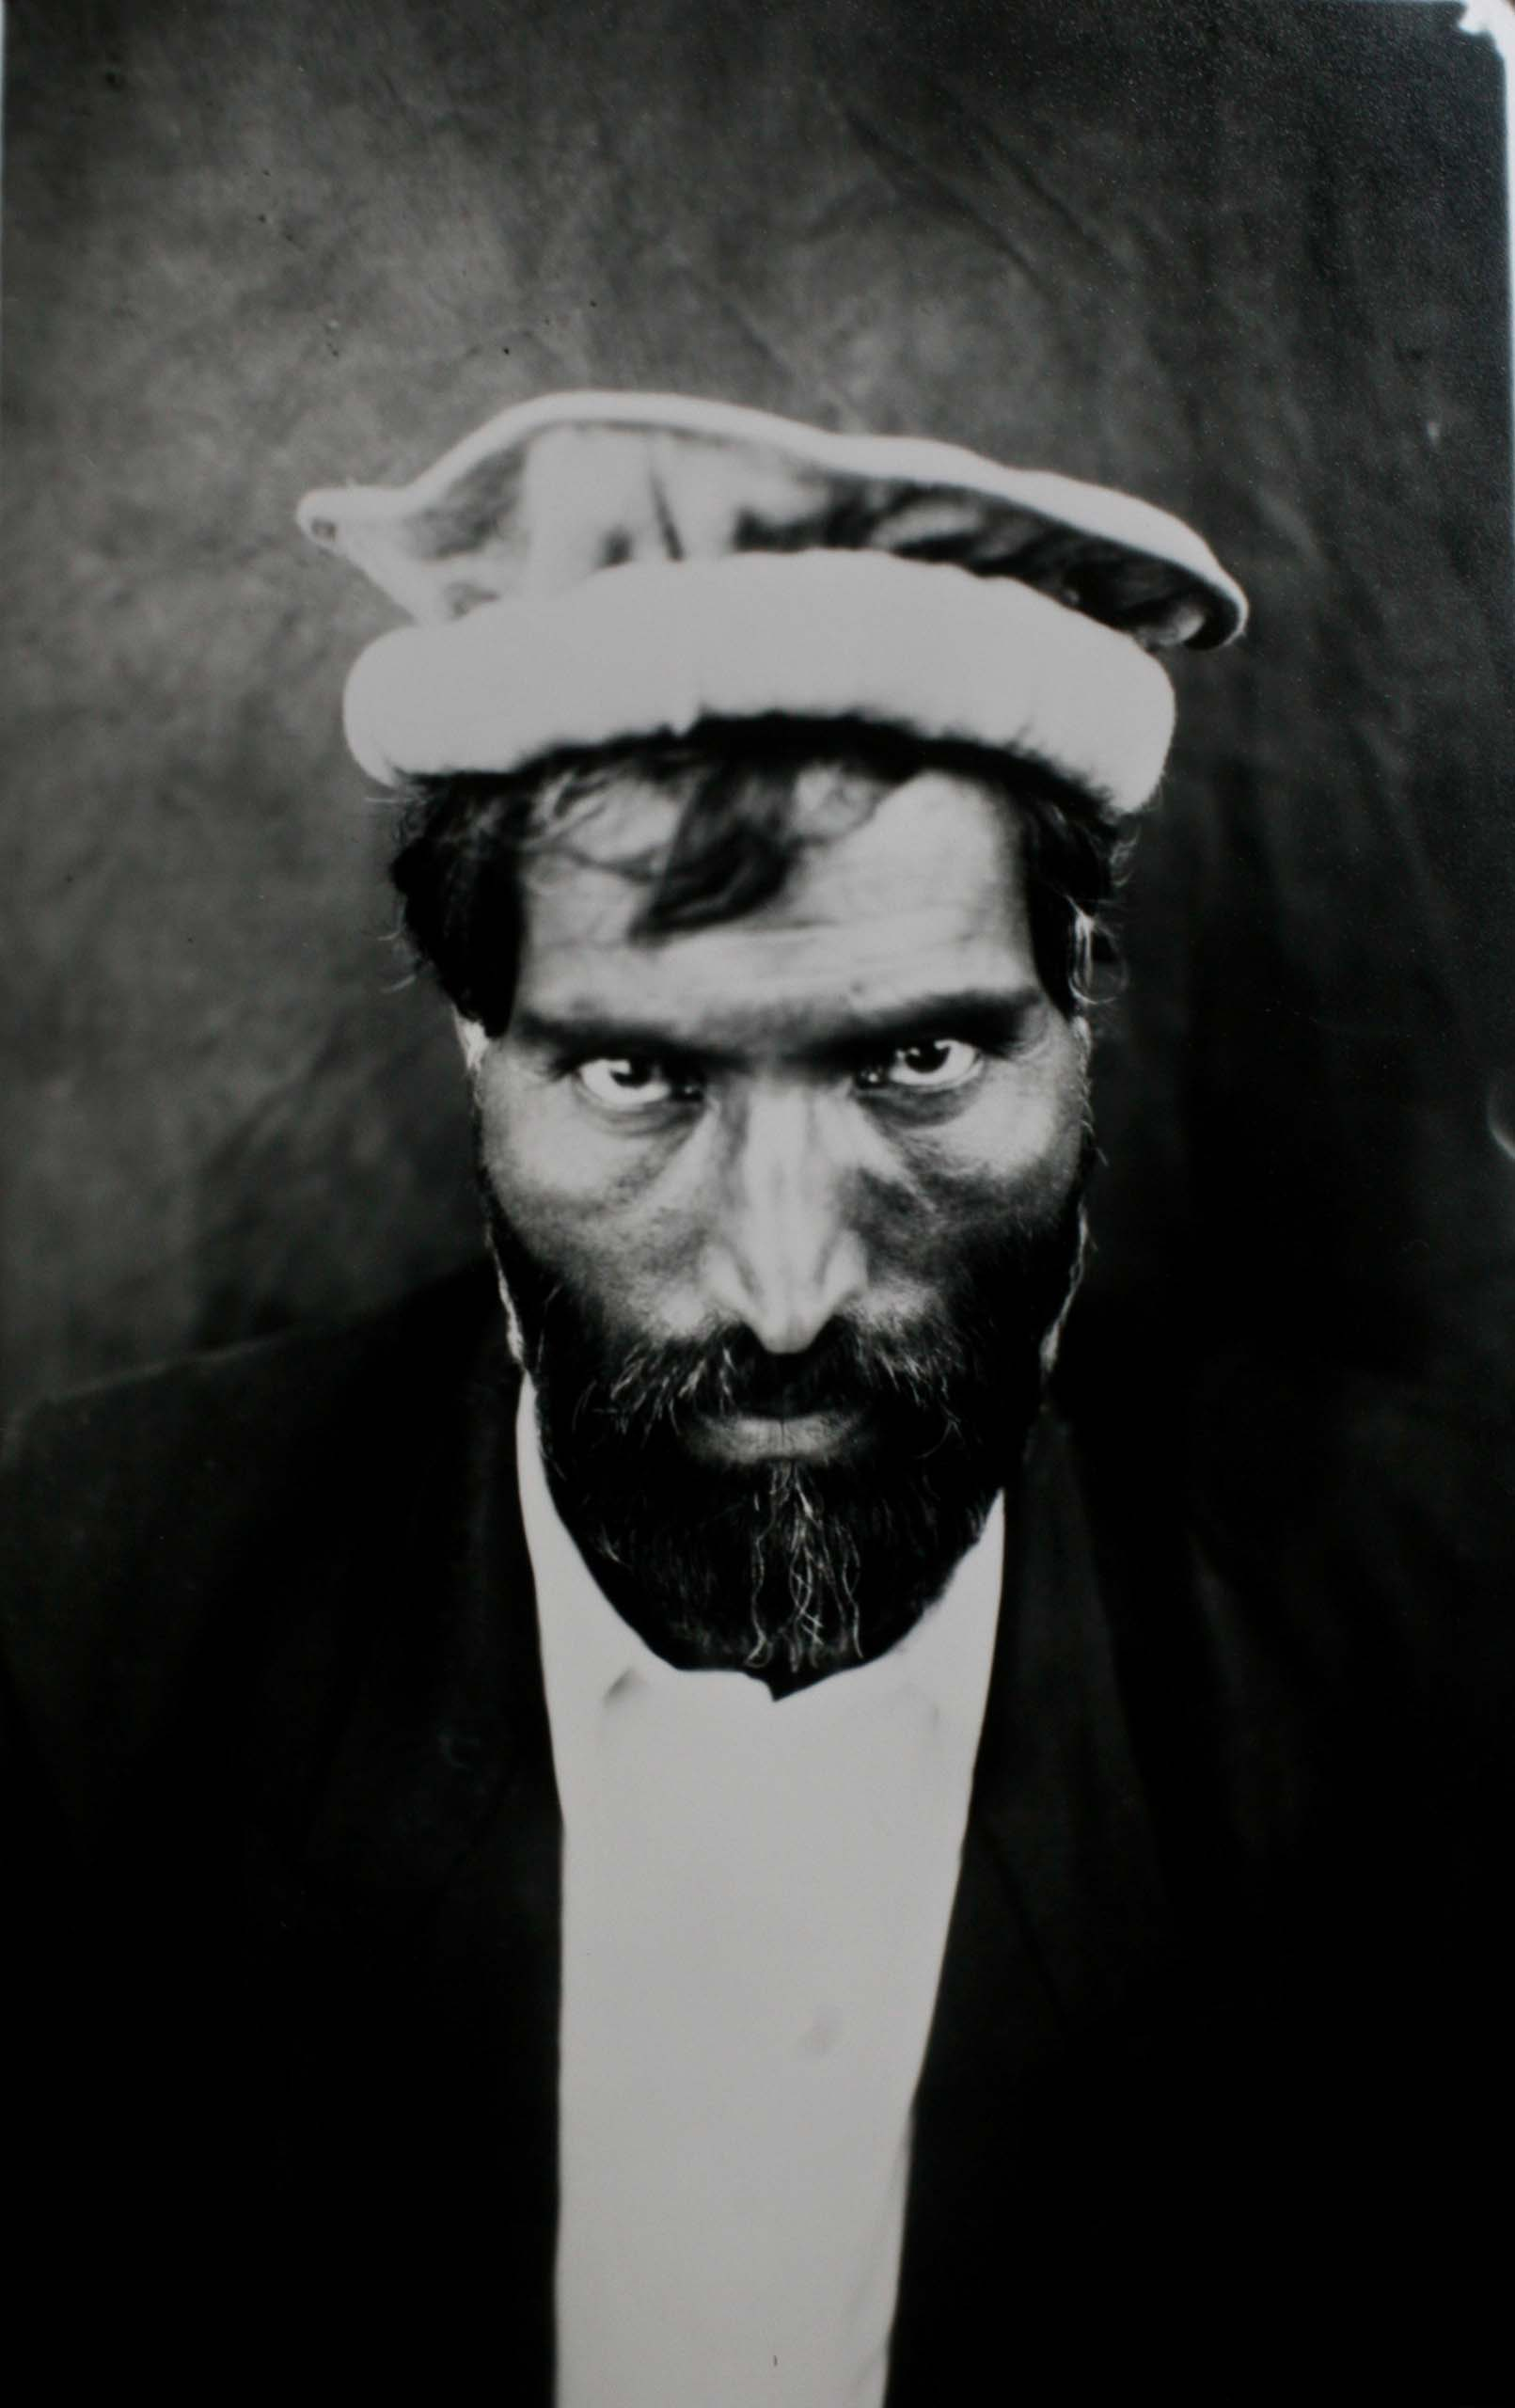 Day worker in Kabul from the series La Cámara Afgana, 2006.